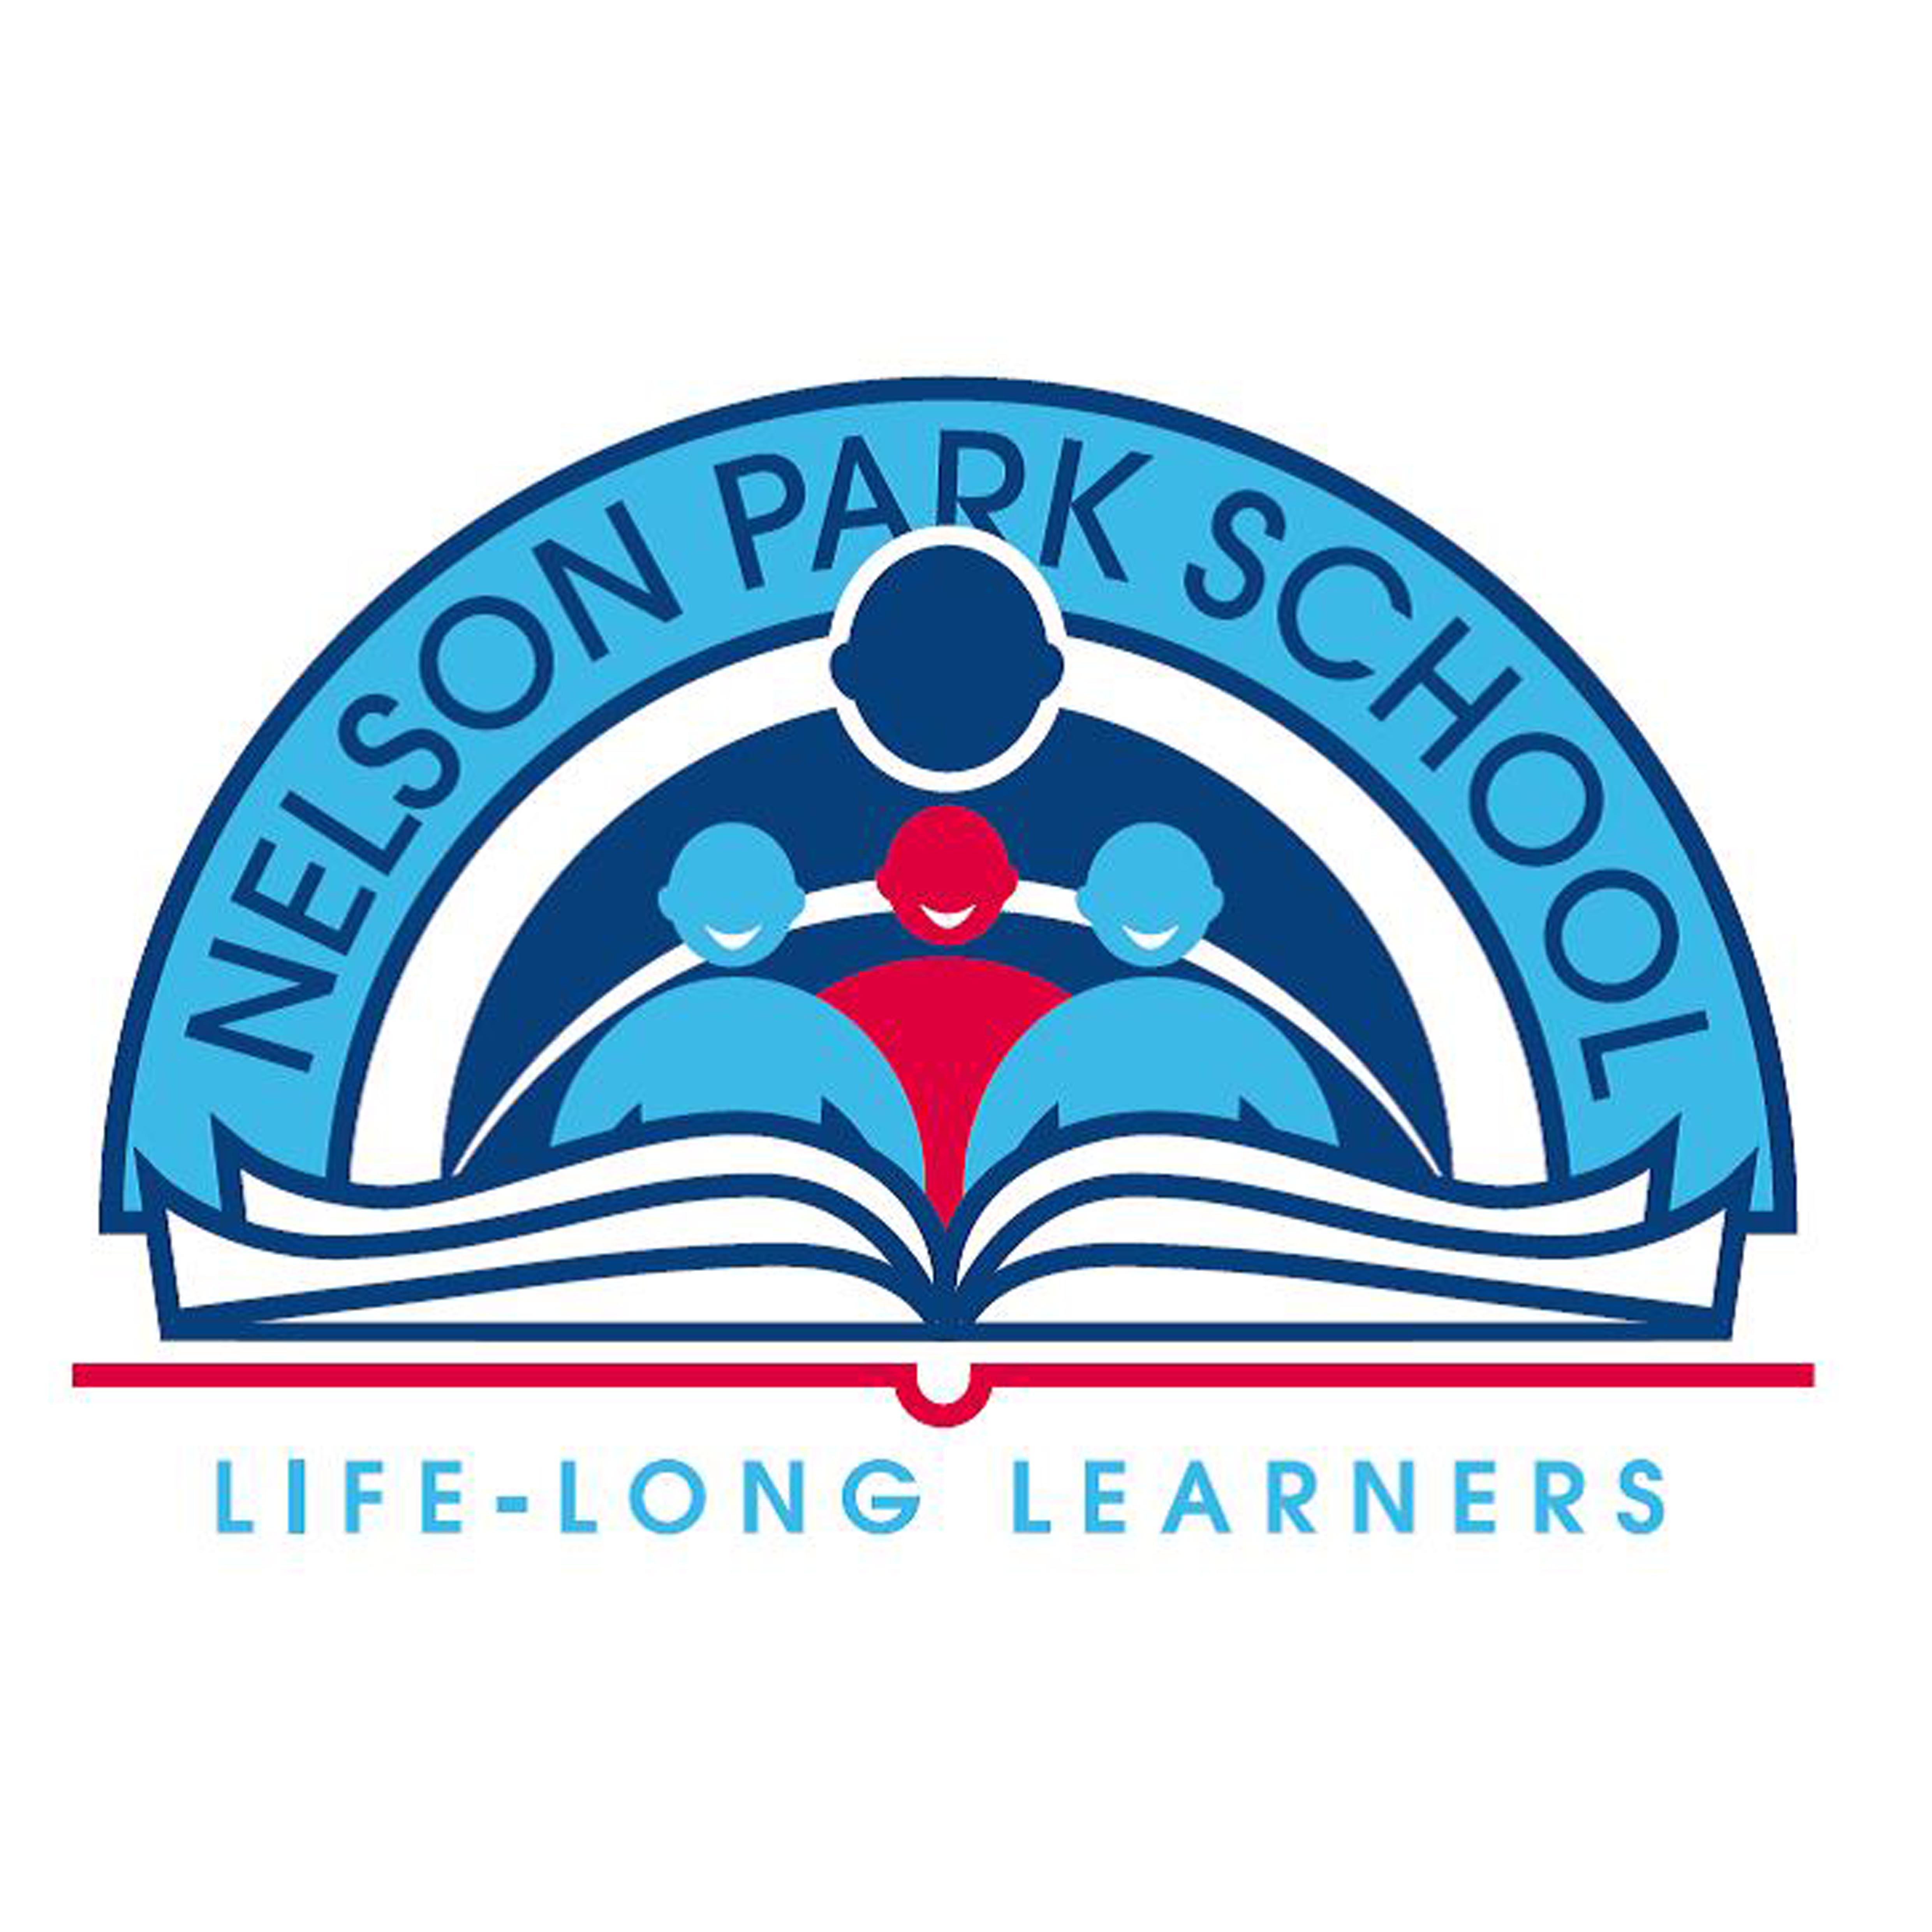 Nelson Park School